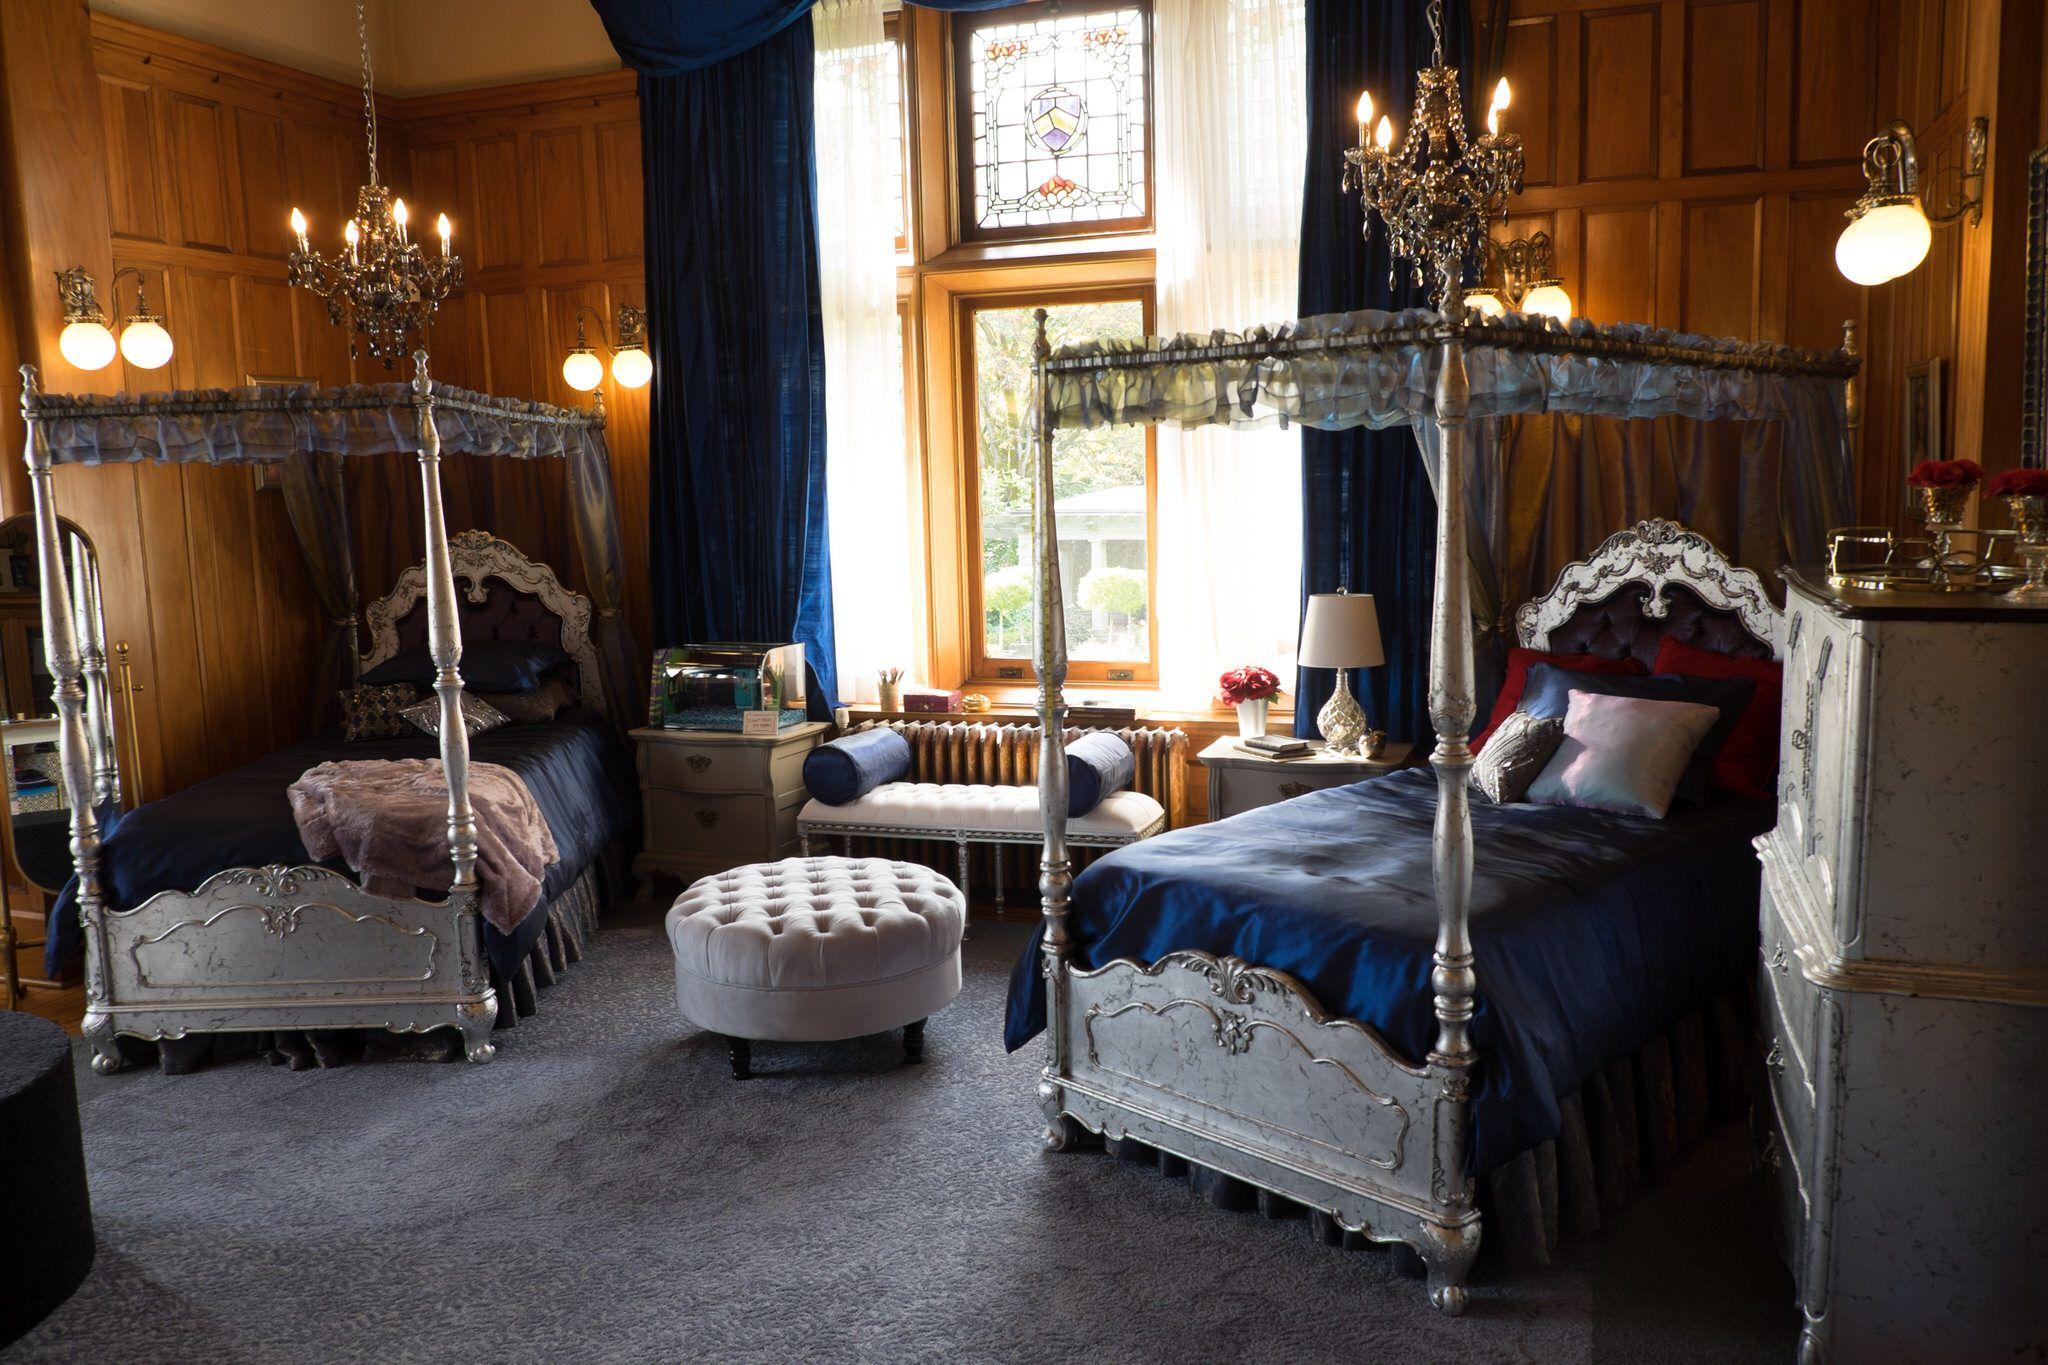 Descendant S 2 Returns To The Vk Girls Dorm Room Where Evie Sofia Carson Has Brought Her Own Super Sophisticated Isle Styl Descendants Descendants 2 Design